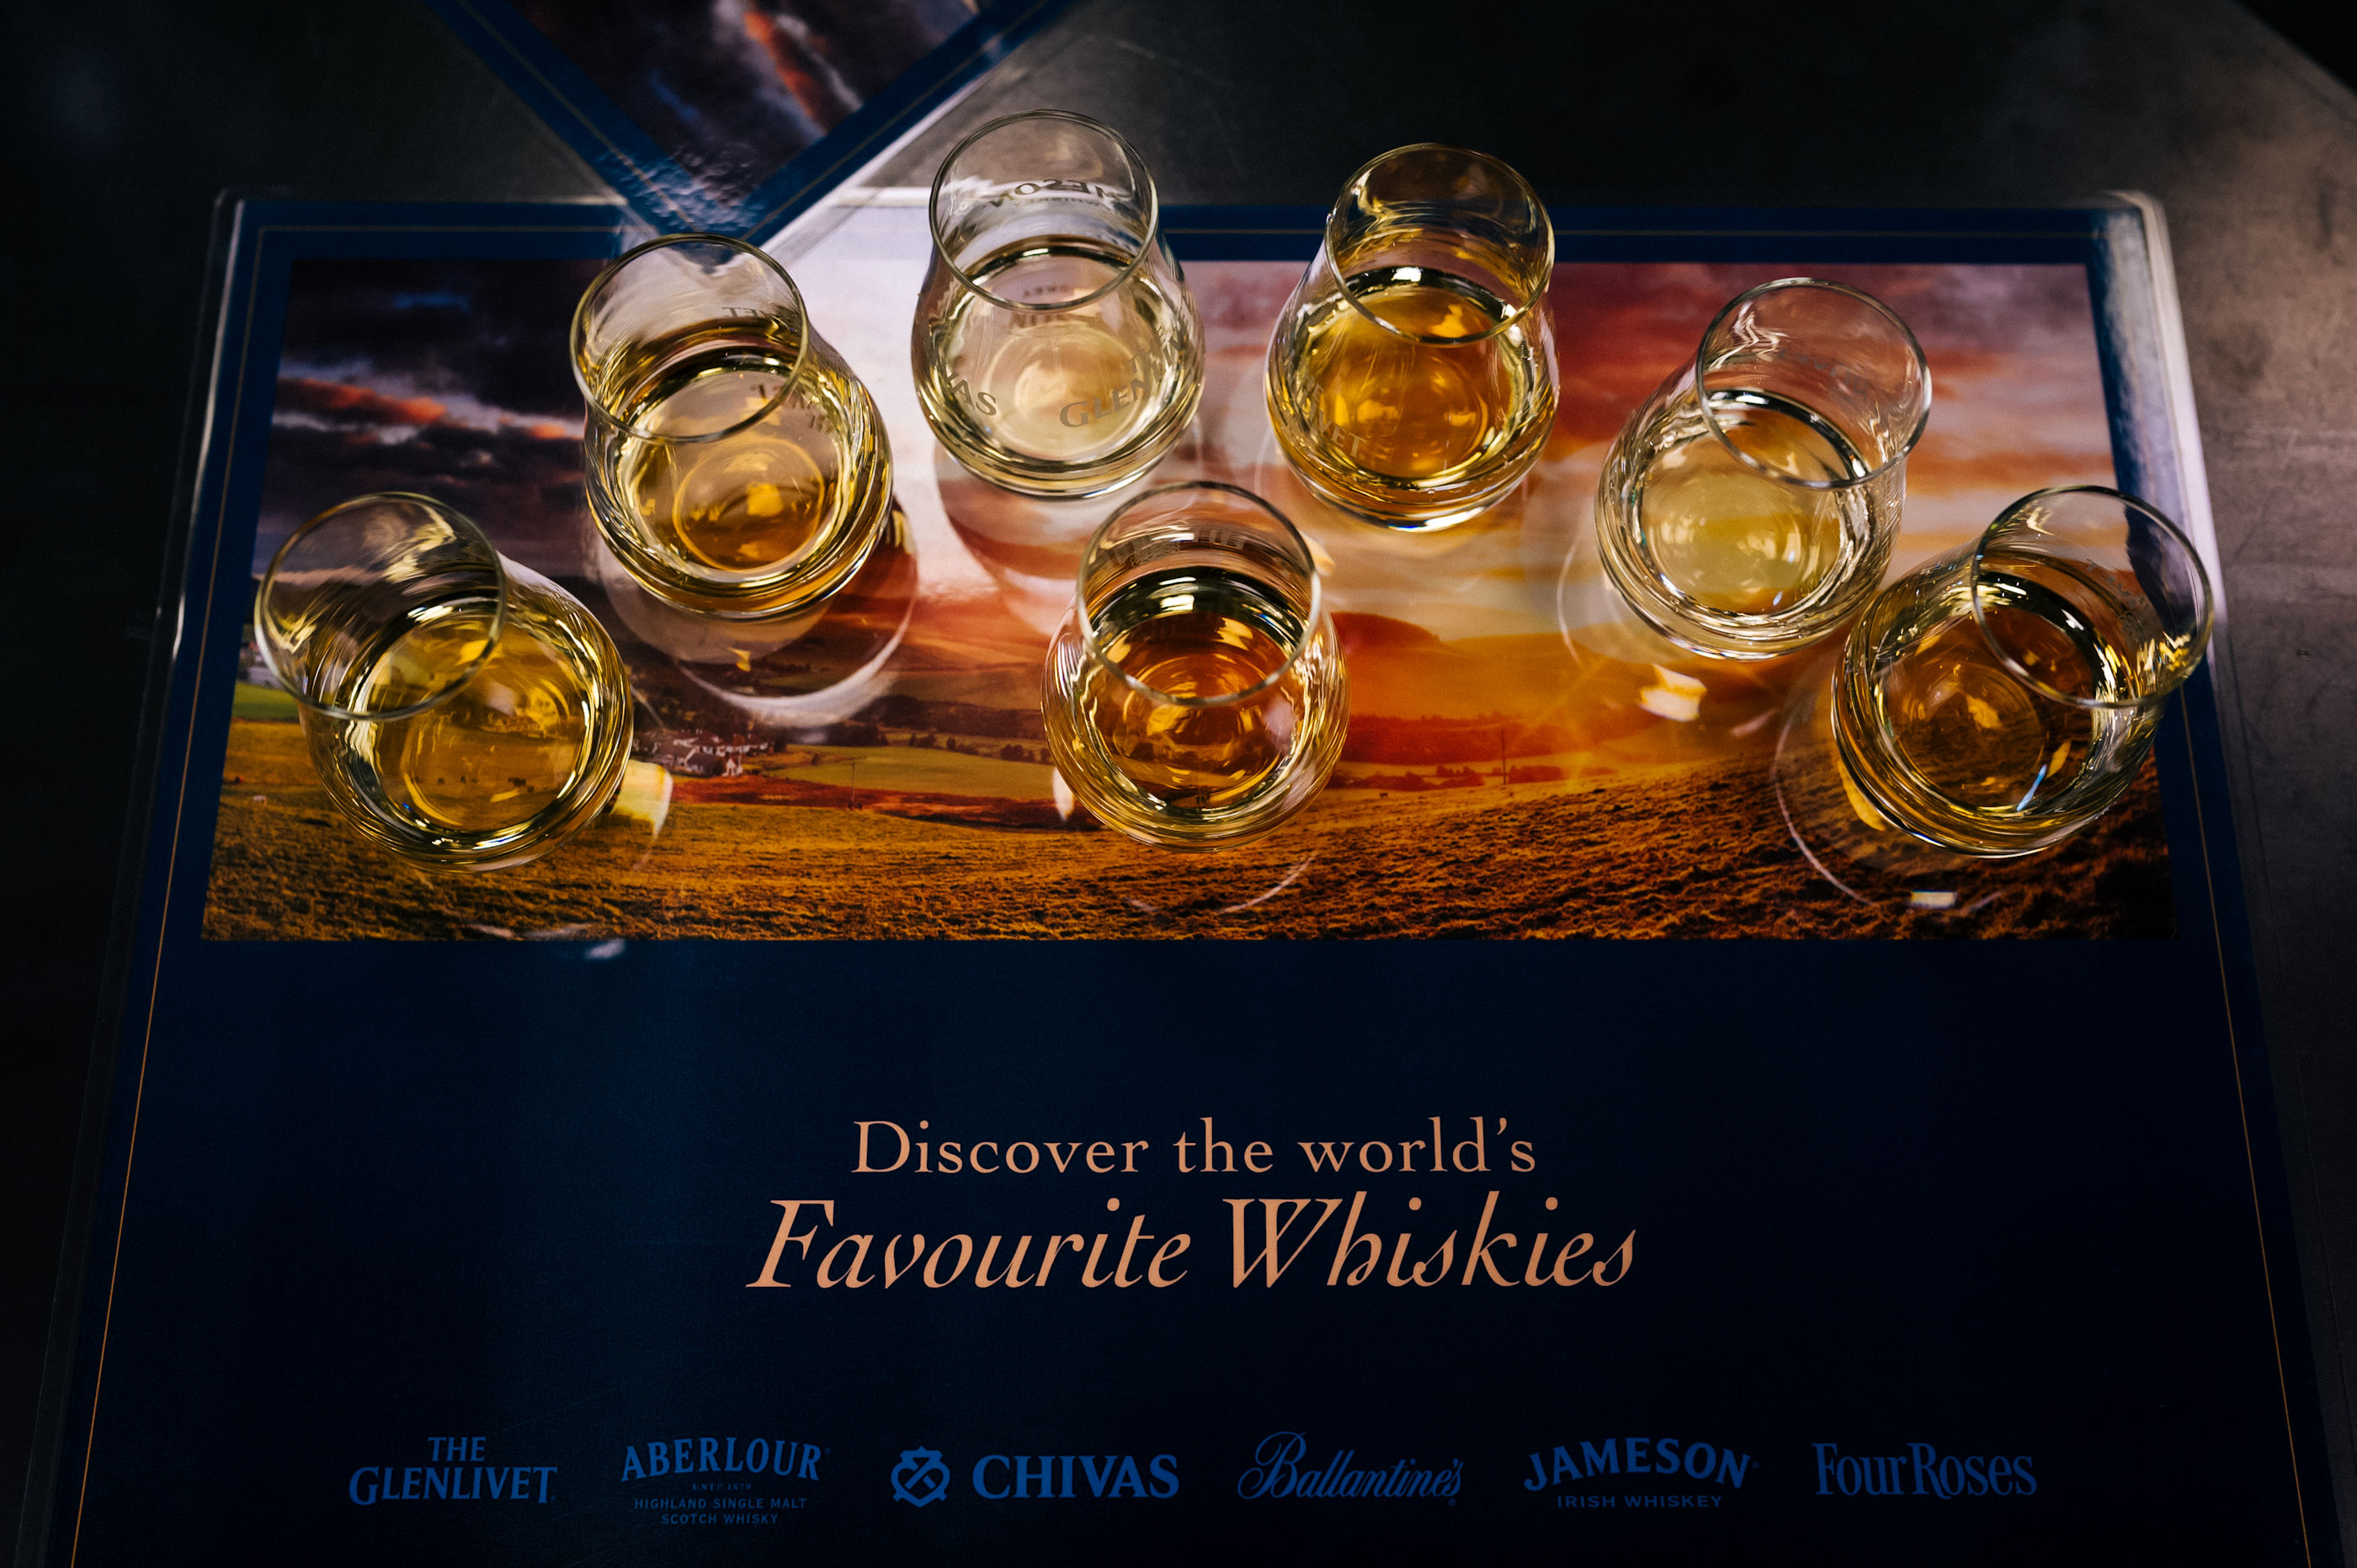 Whisky Club Rotterdam The Glenlivet proeverij dinsdag 21-02-2016